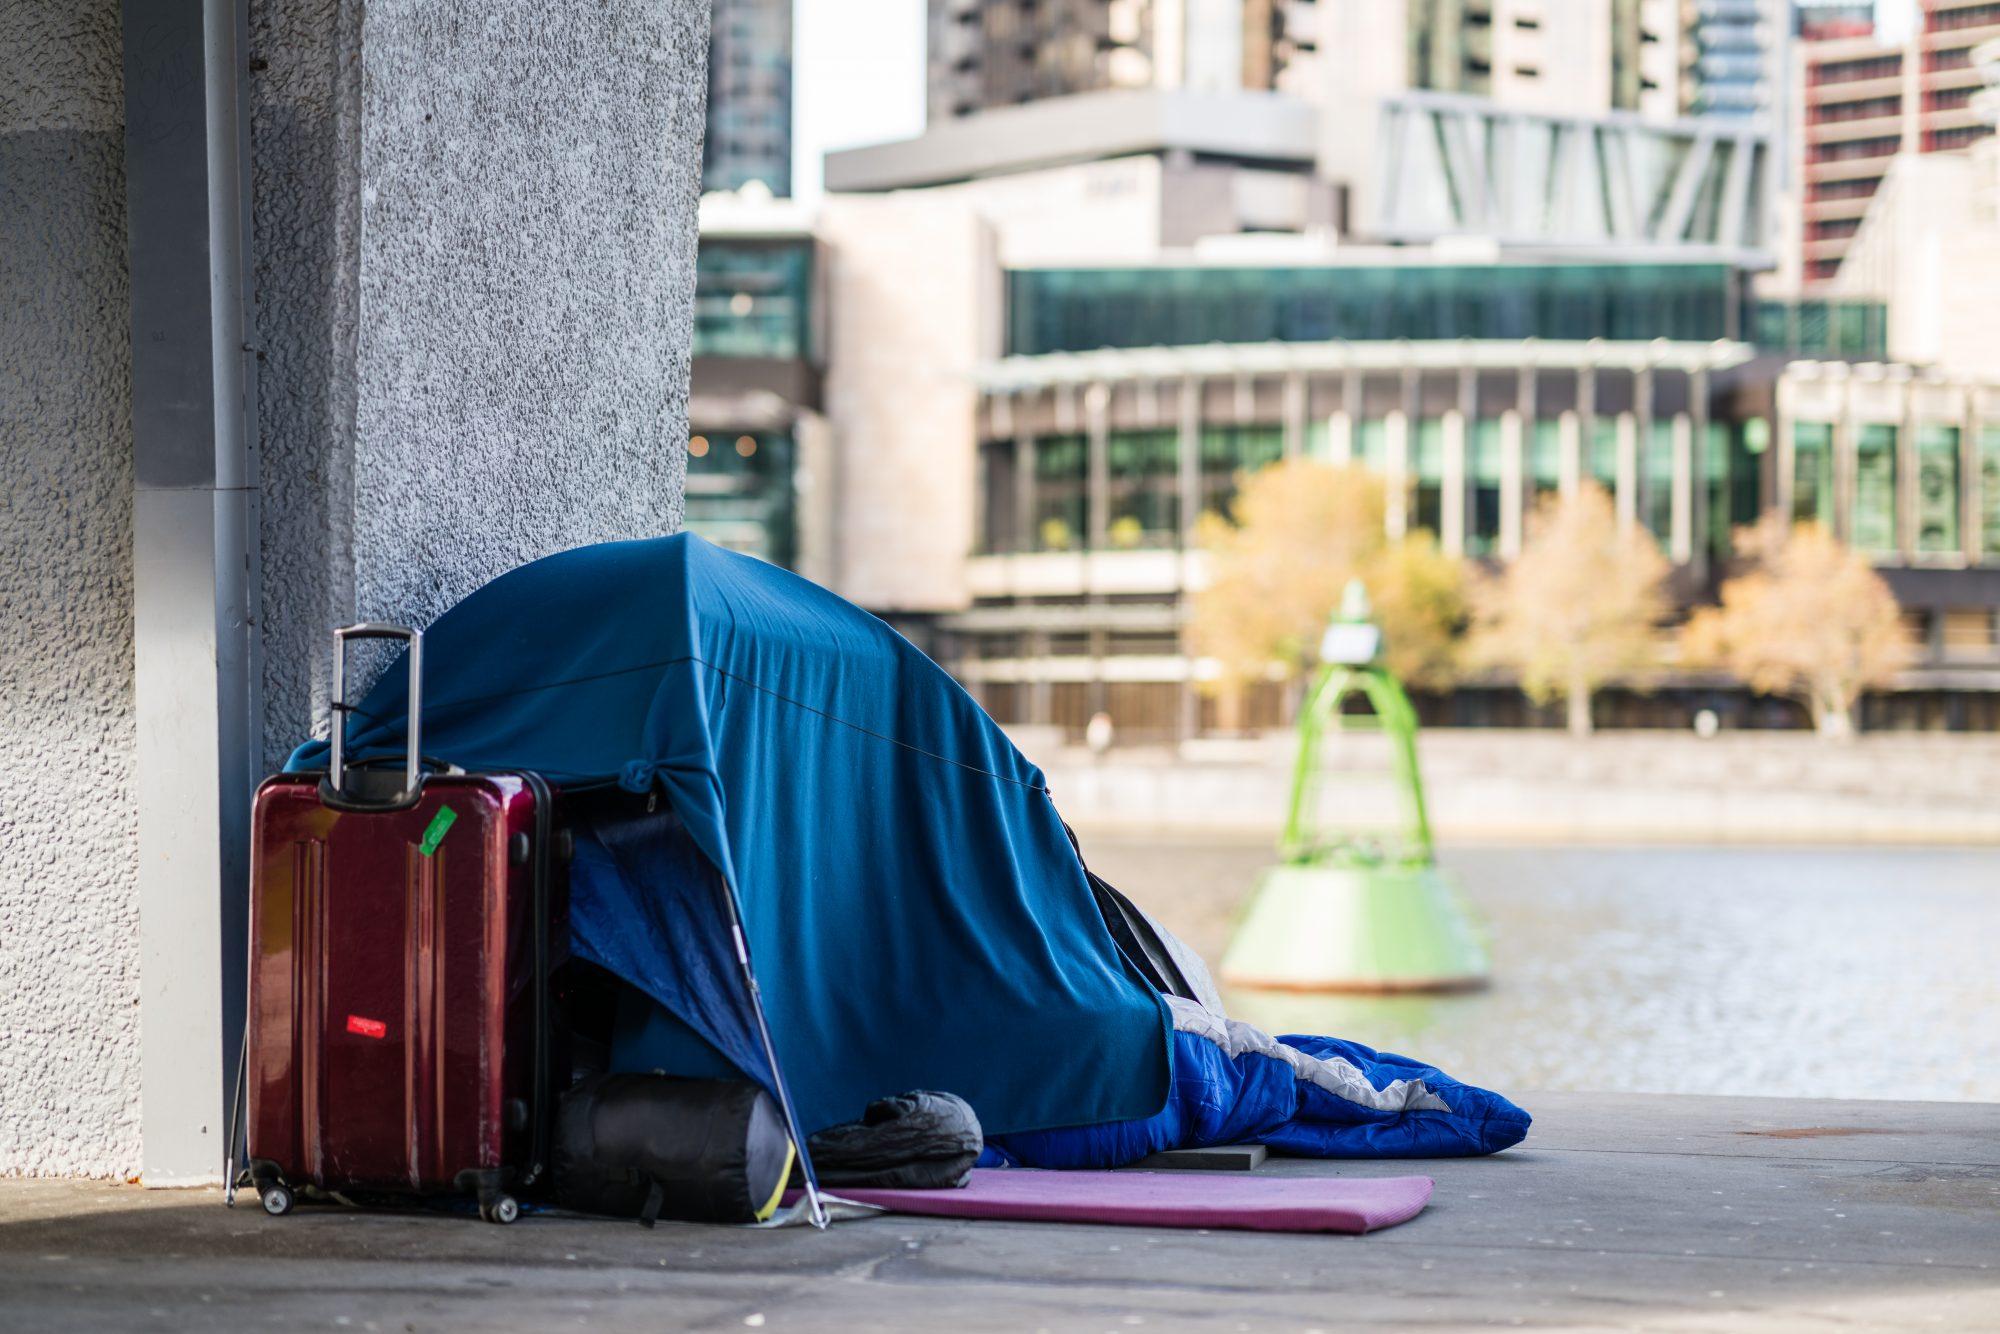 Homelessness in Melbourne